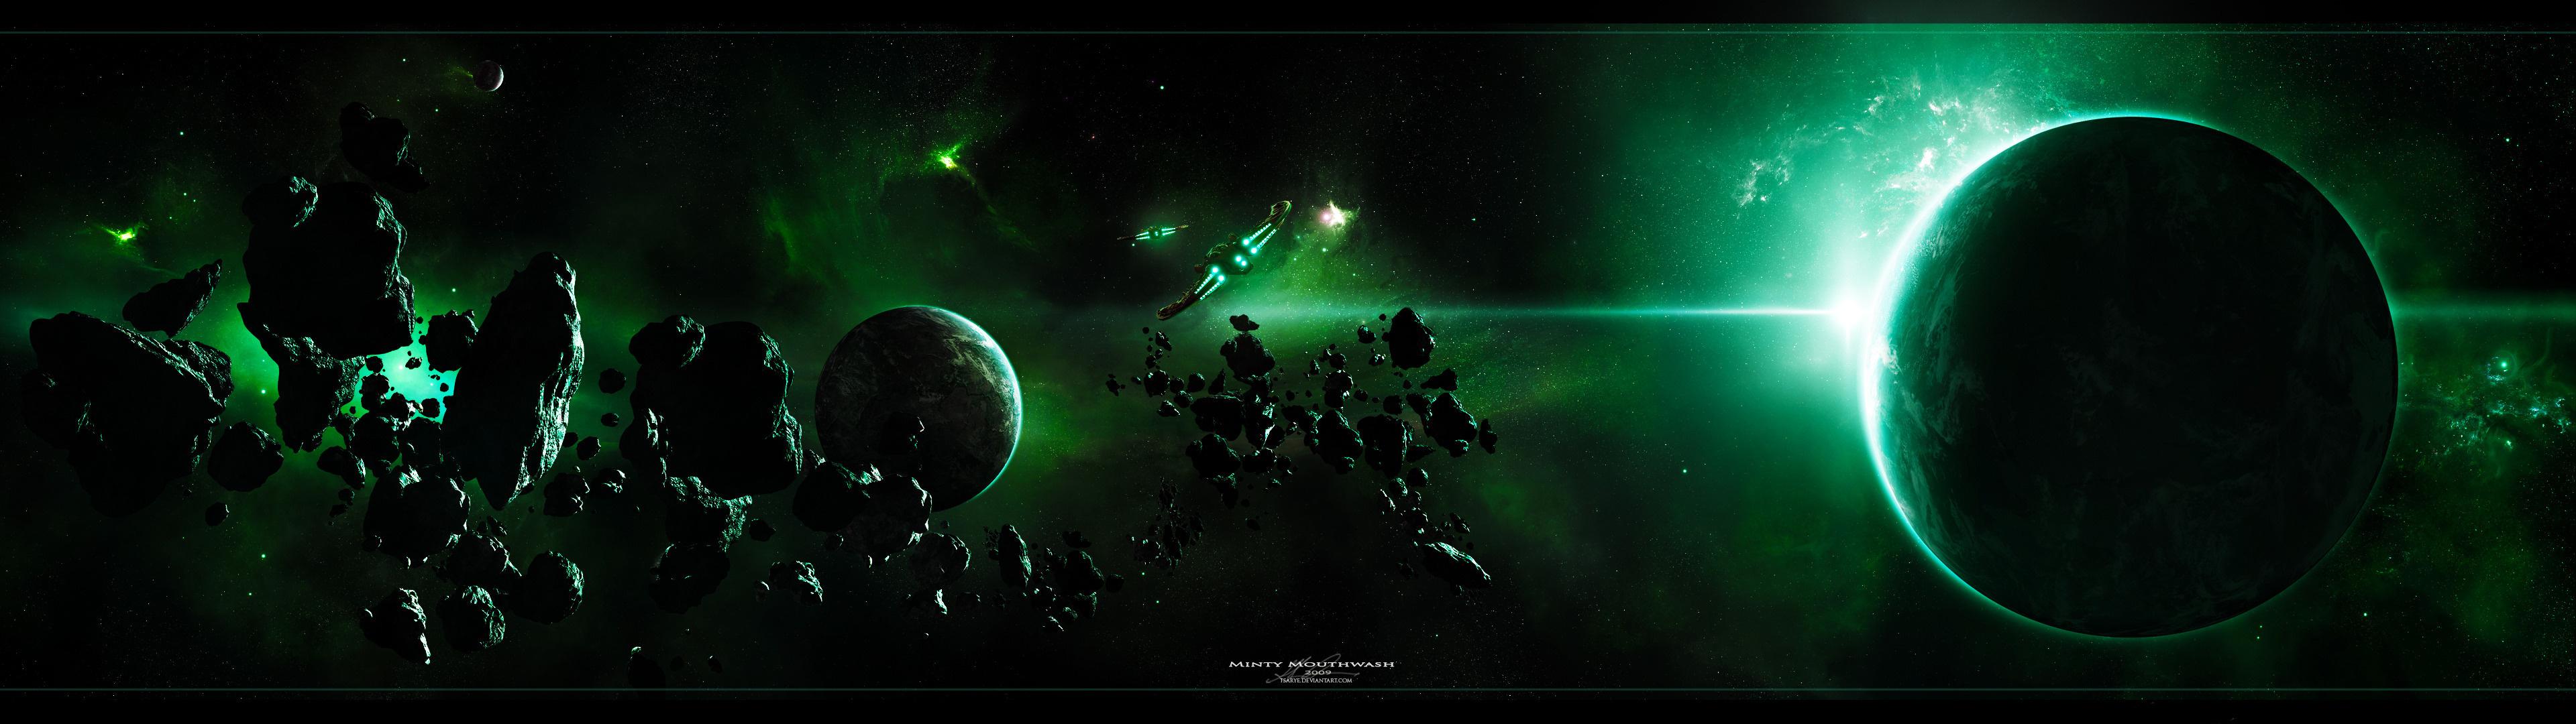 Wallpaper space planet spaceship asteroid desktop wallpaper 3D 3840x1080